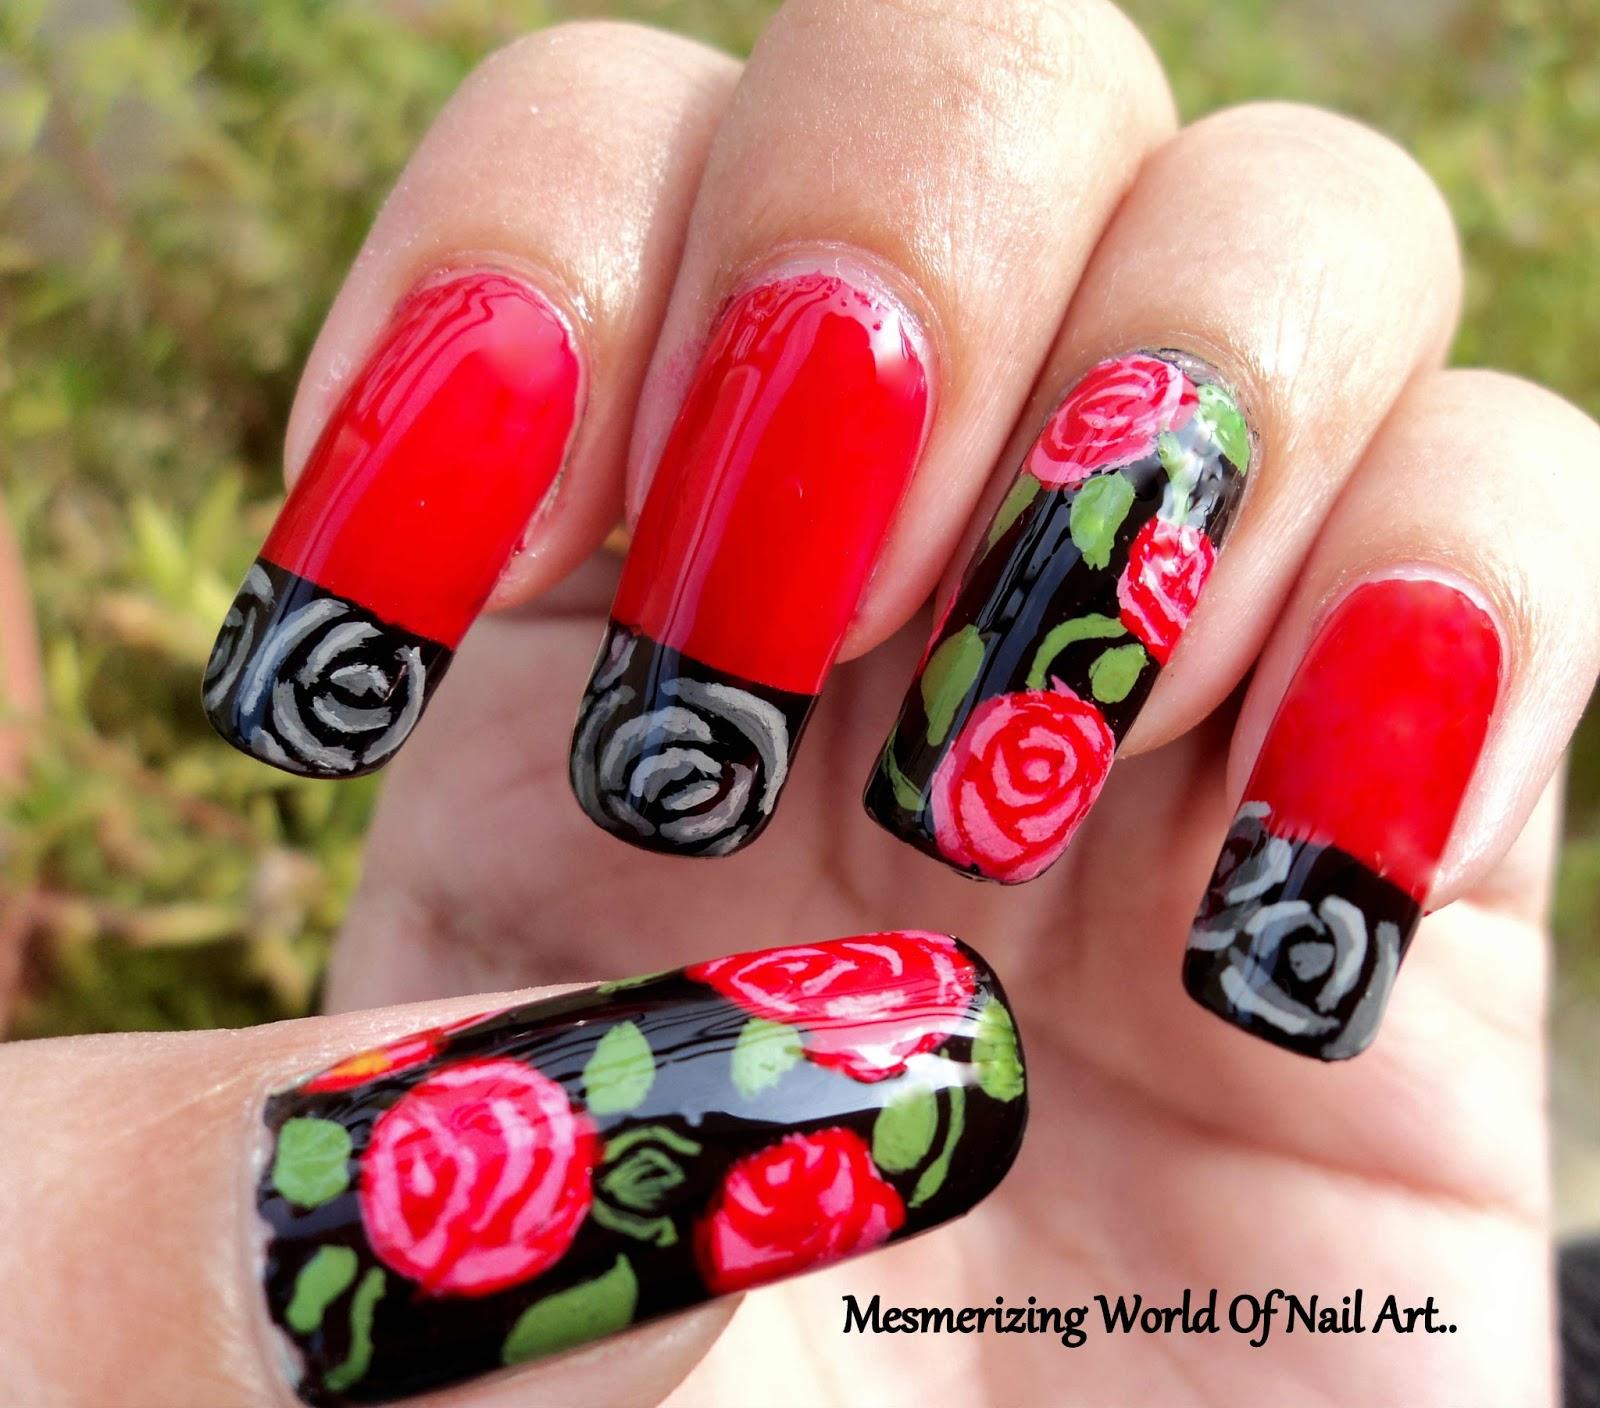 Mesmerizing World Of Nail Art...: Freehand Rose Nail Art